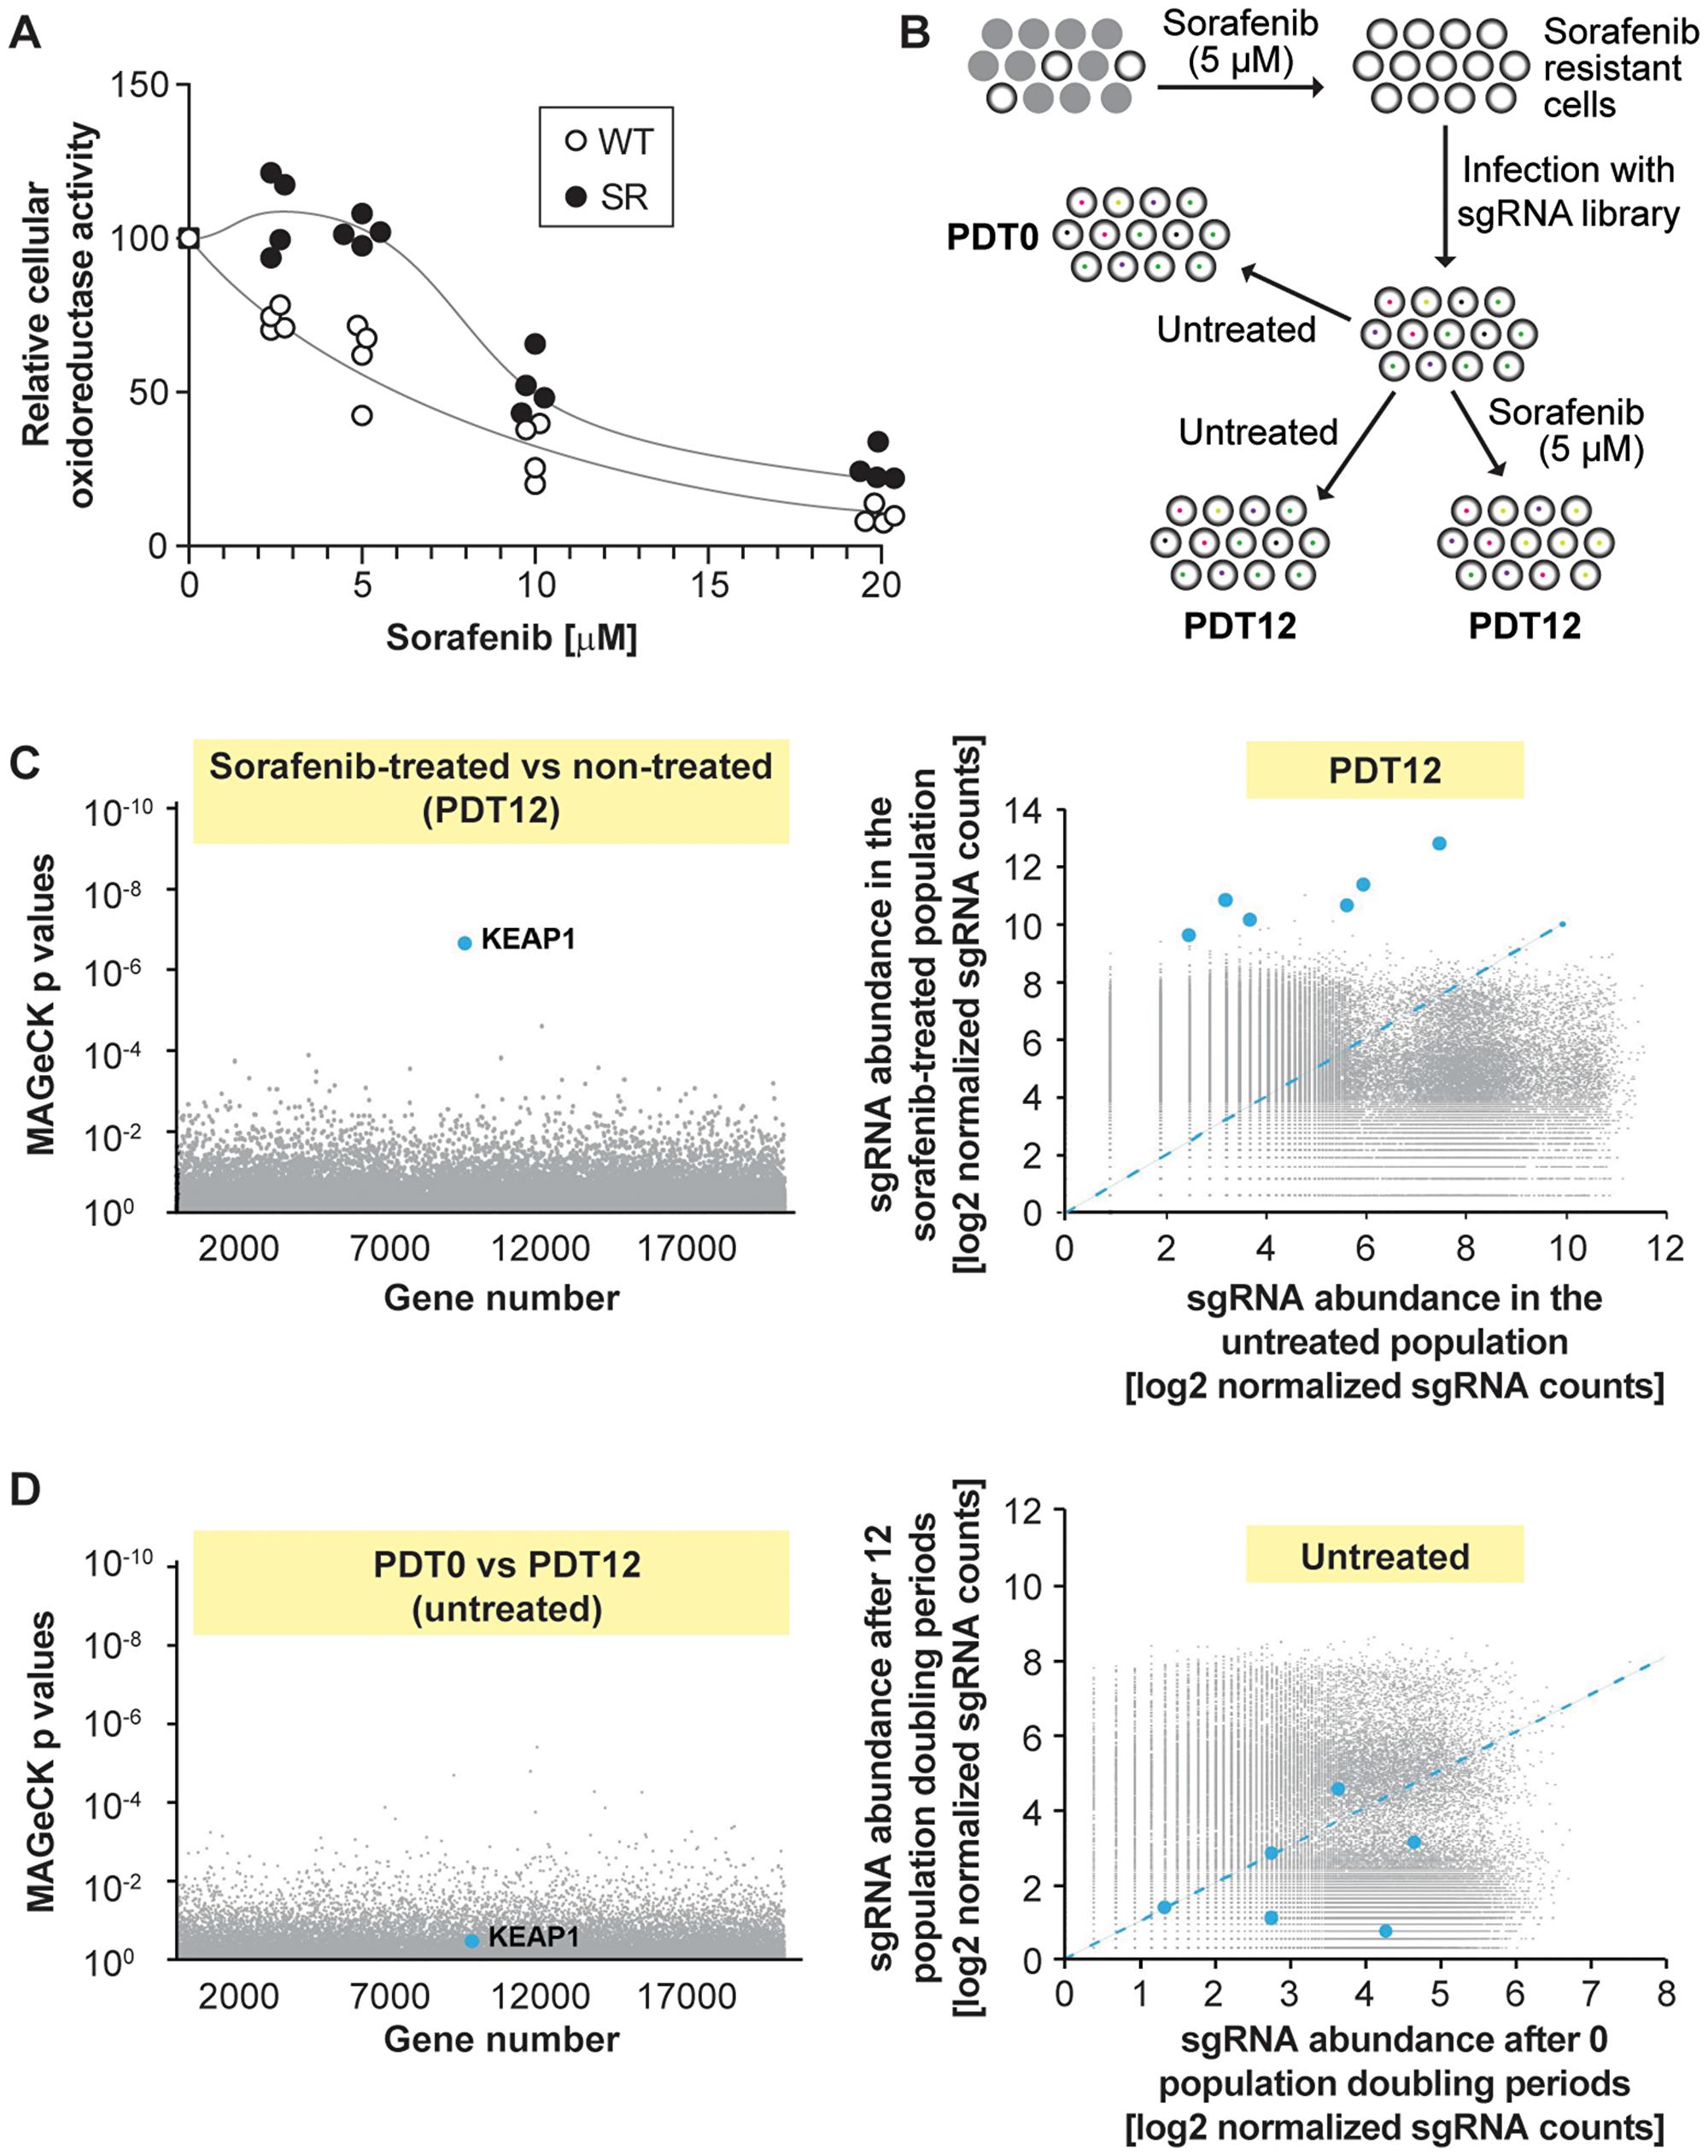 Single guide RNAs targeting KEAP1 are enriched in sorafenib-treated HUH-7 cells.